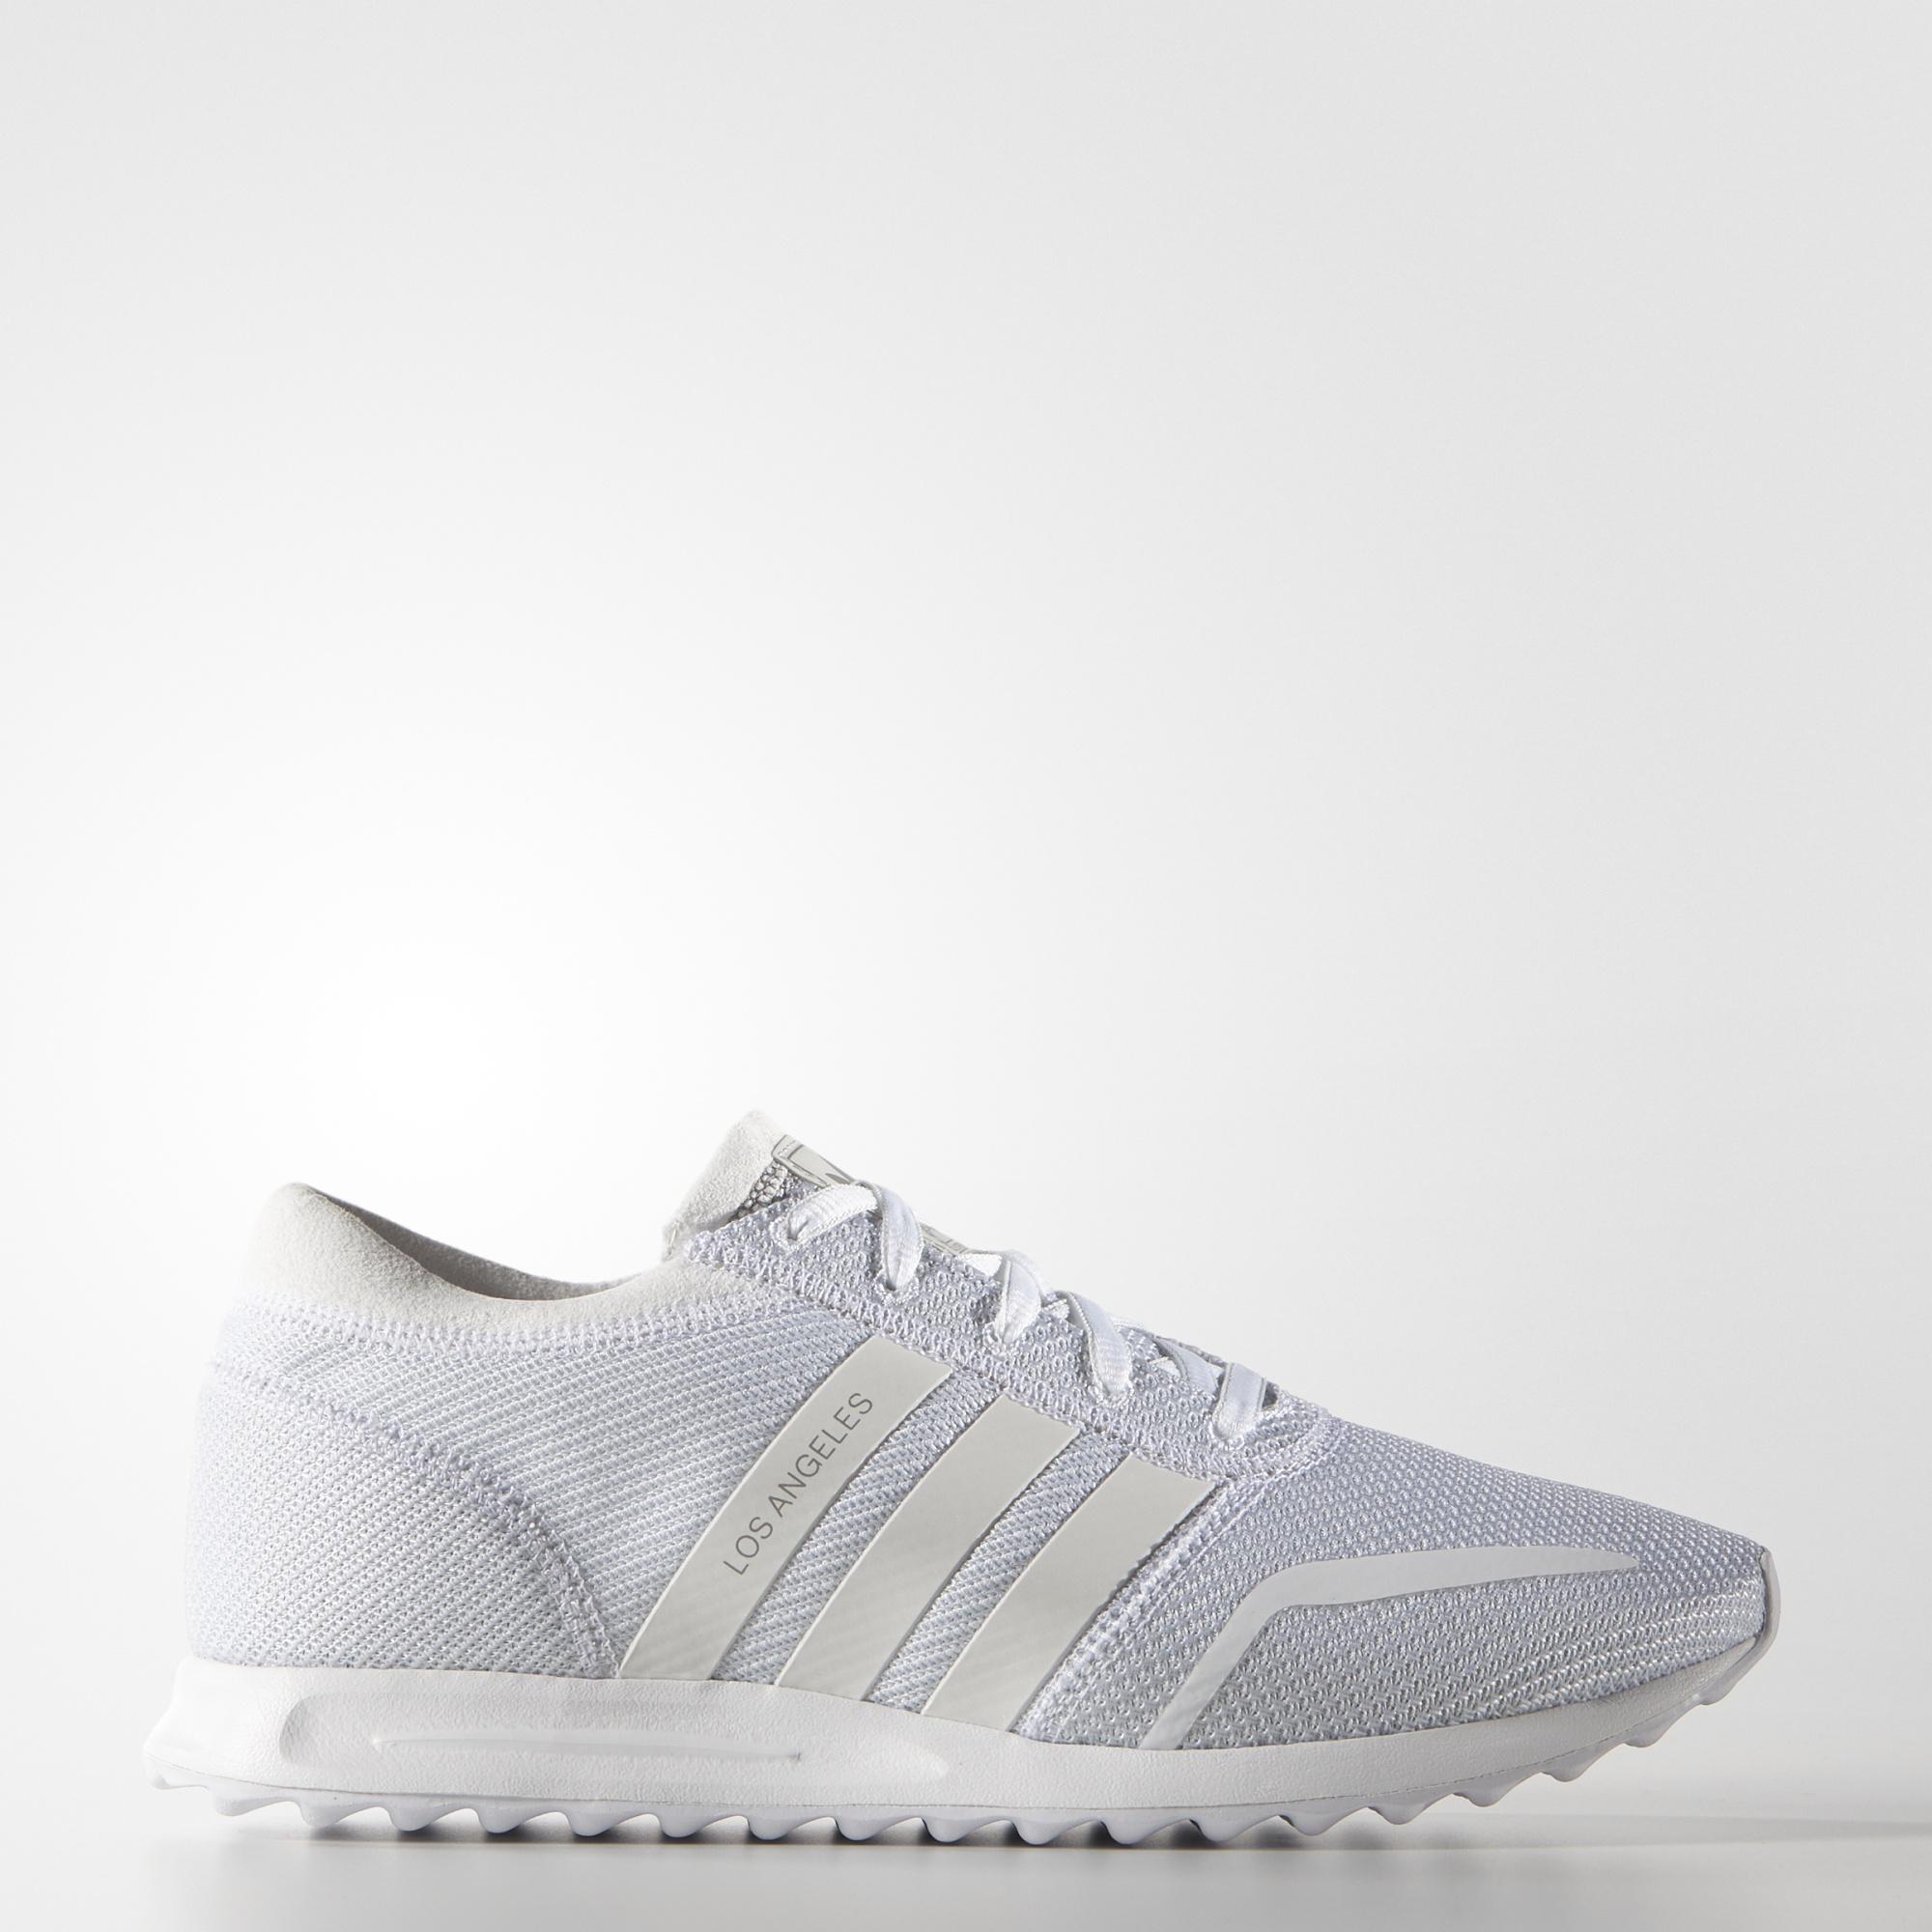 adidas los angeles shoes white adidas uk. Black Bedroom Furniture Sets. Home Design Ideas